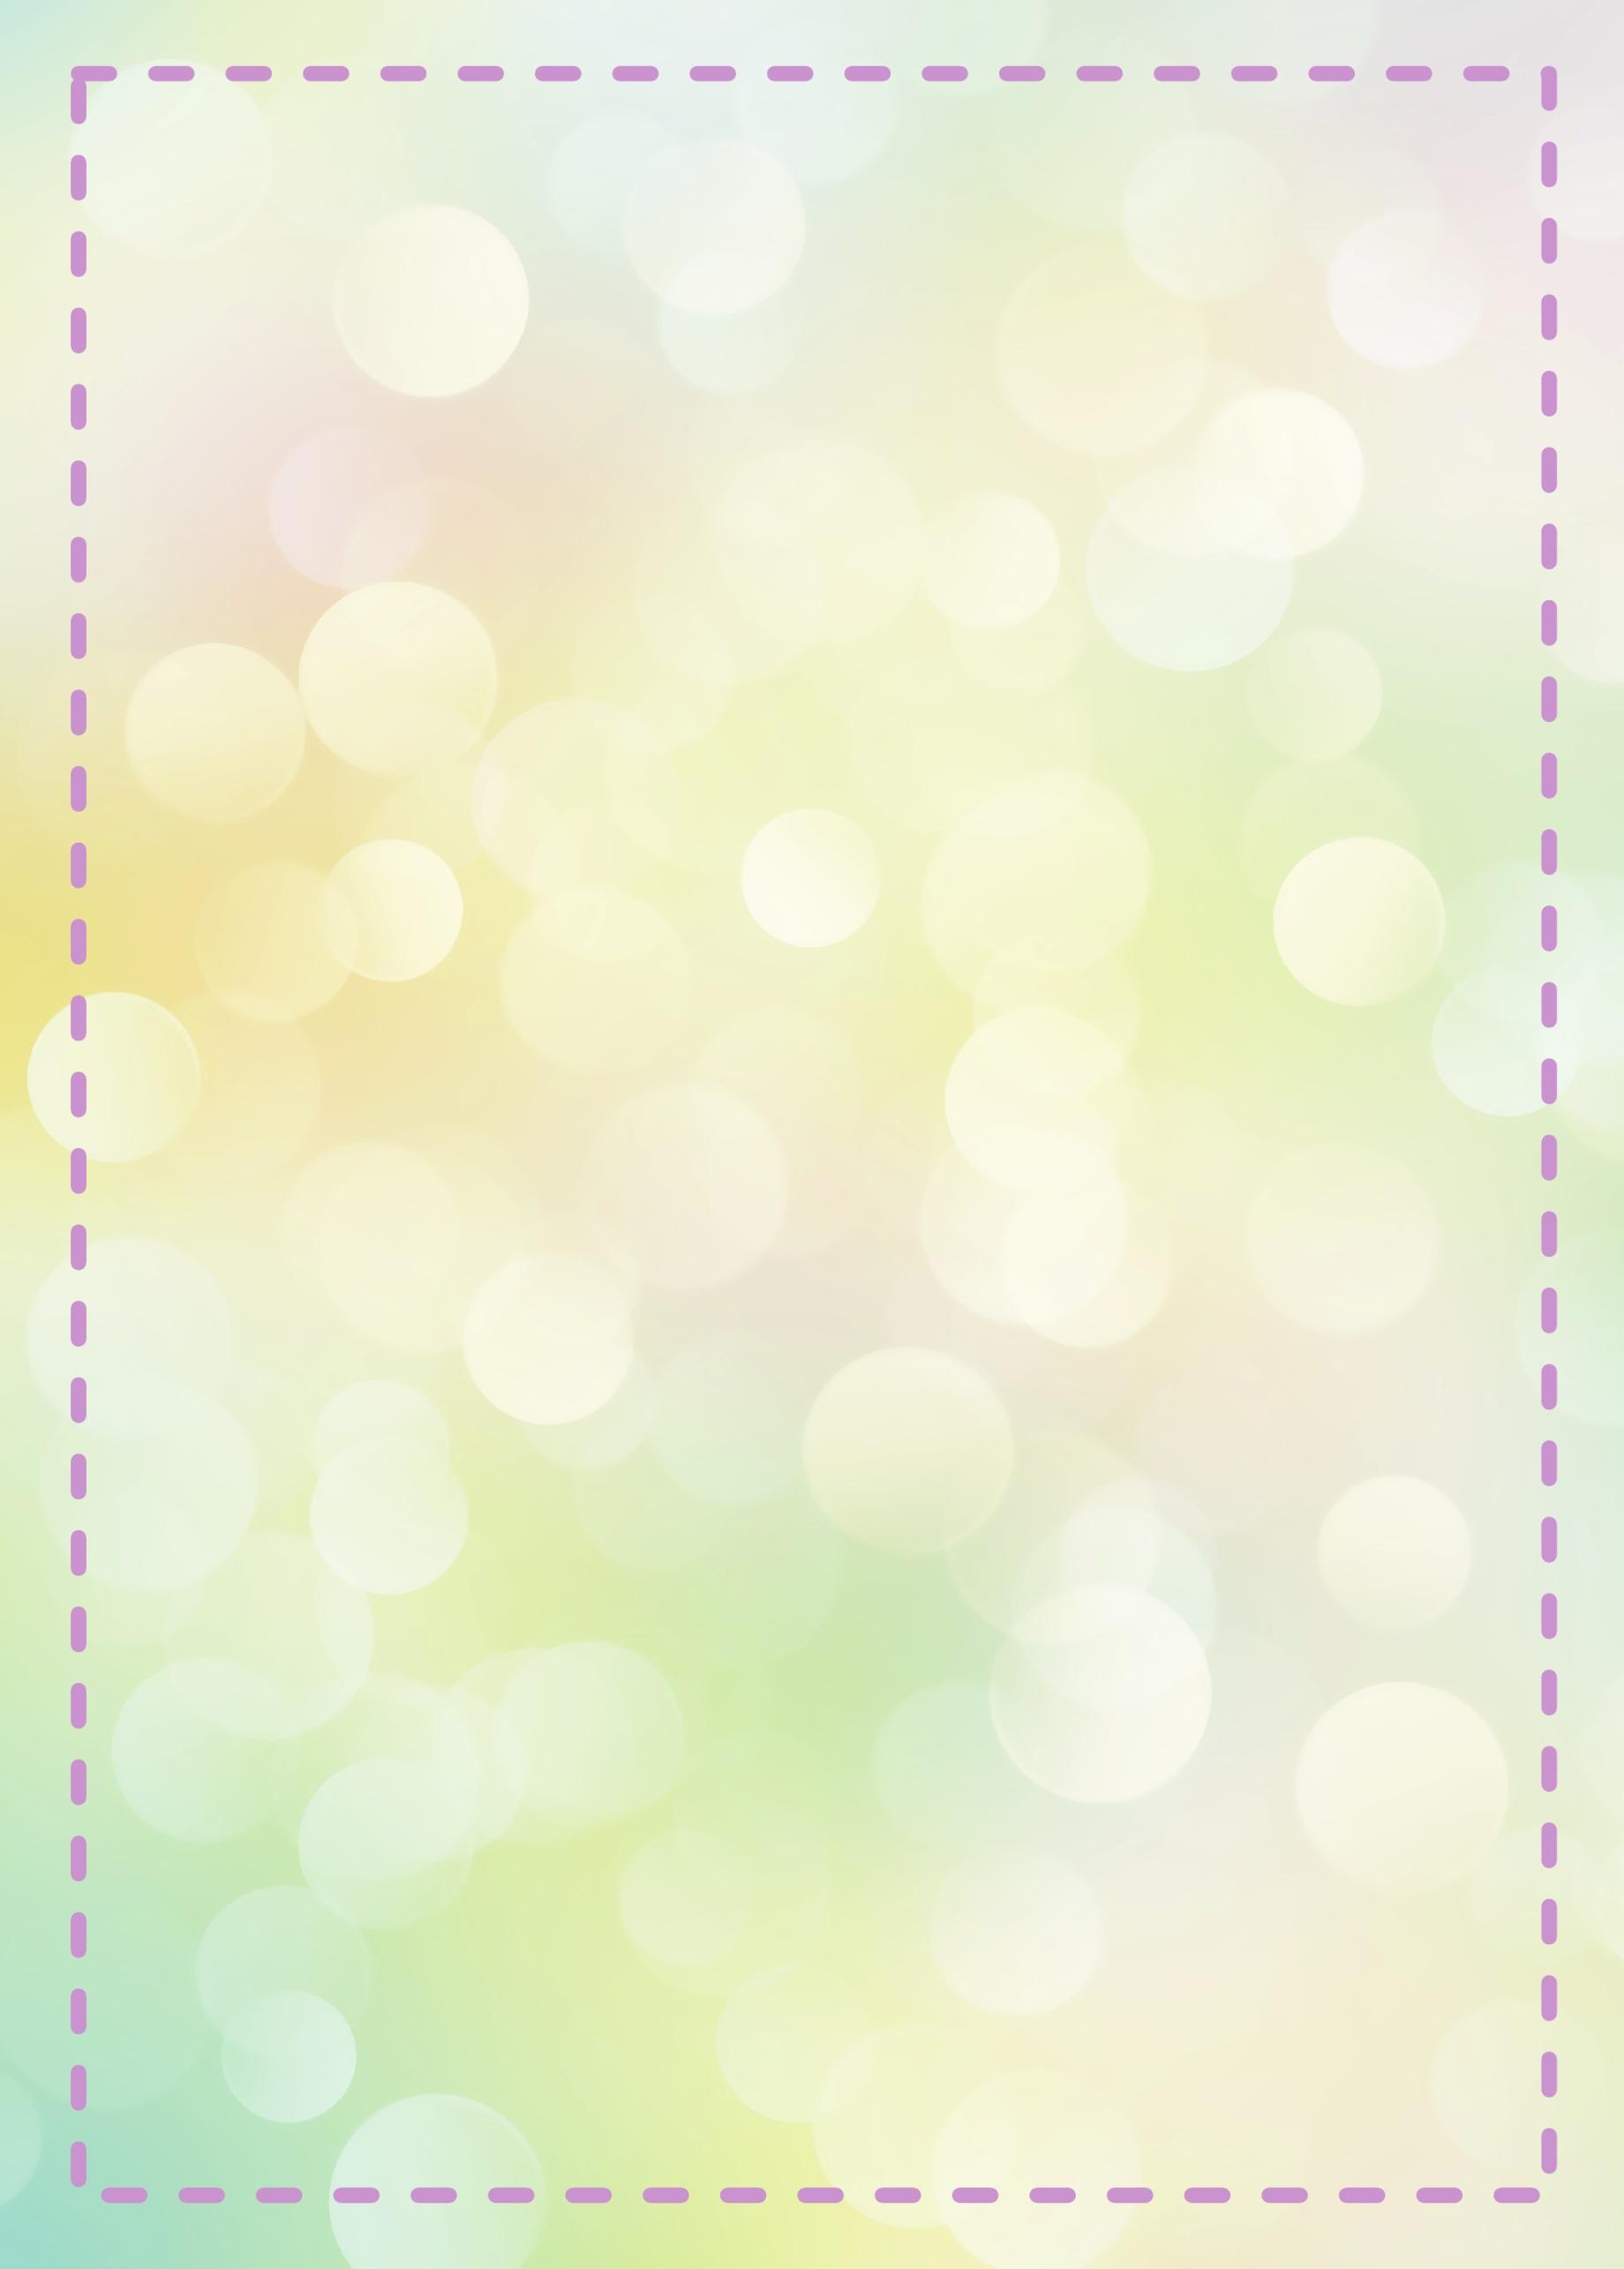 H:\Documents and Settings\тигра\Рабочий стол\рамки- титулки\Игры с буквами для дошкольников_14.png